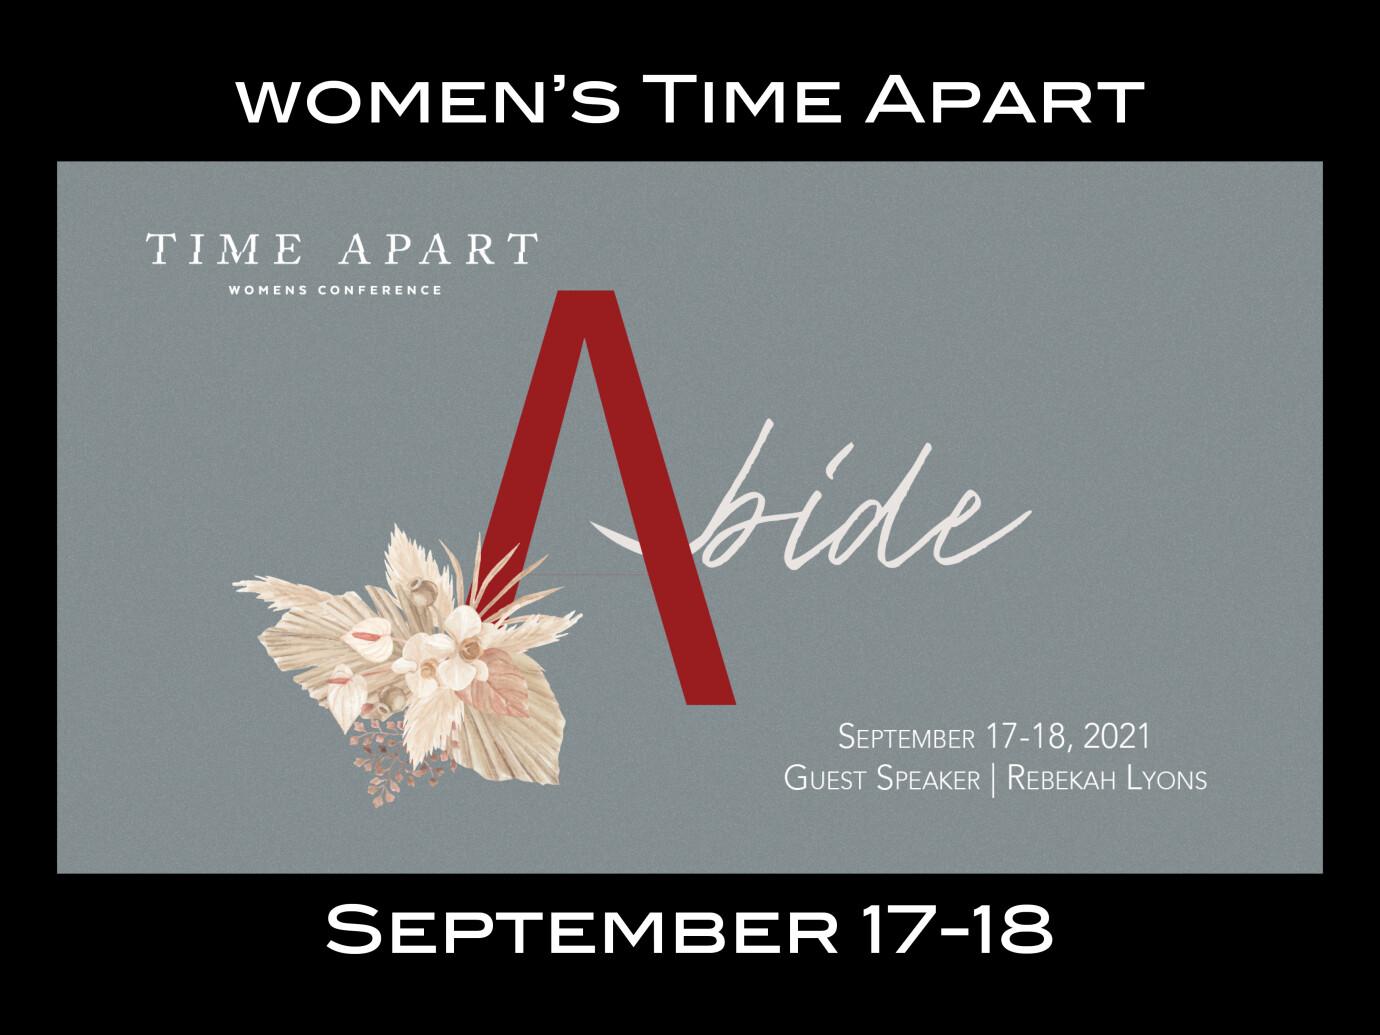 Ladies Time Apart